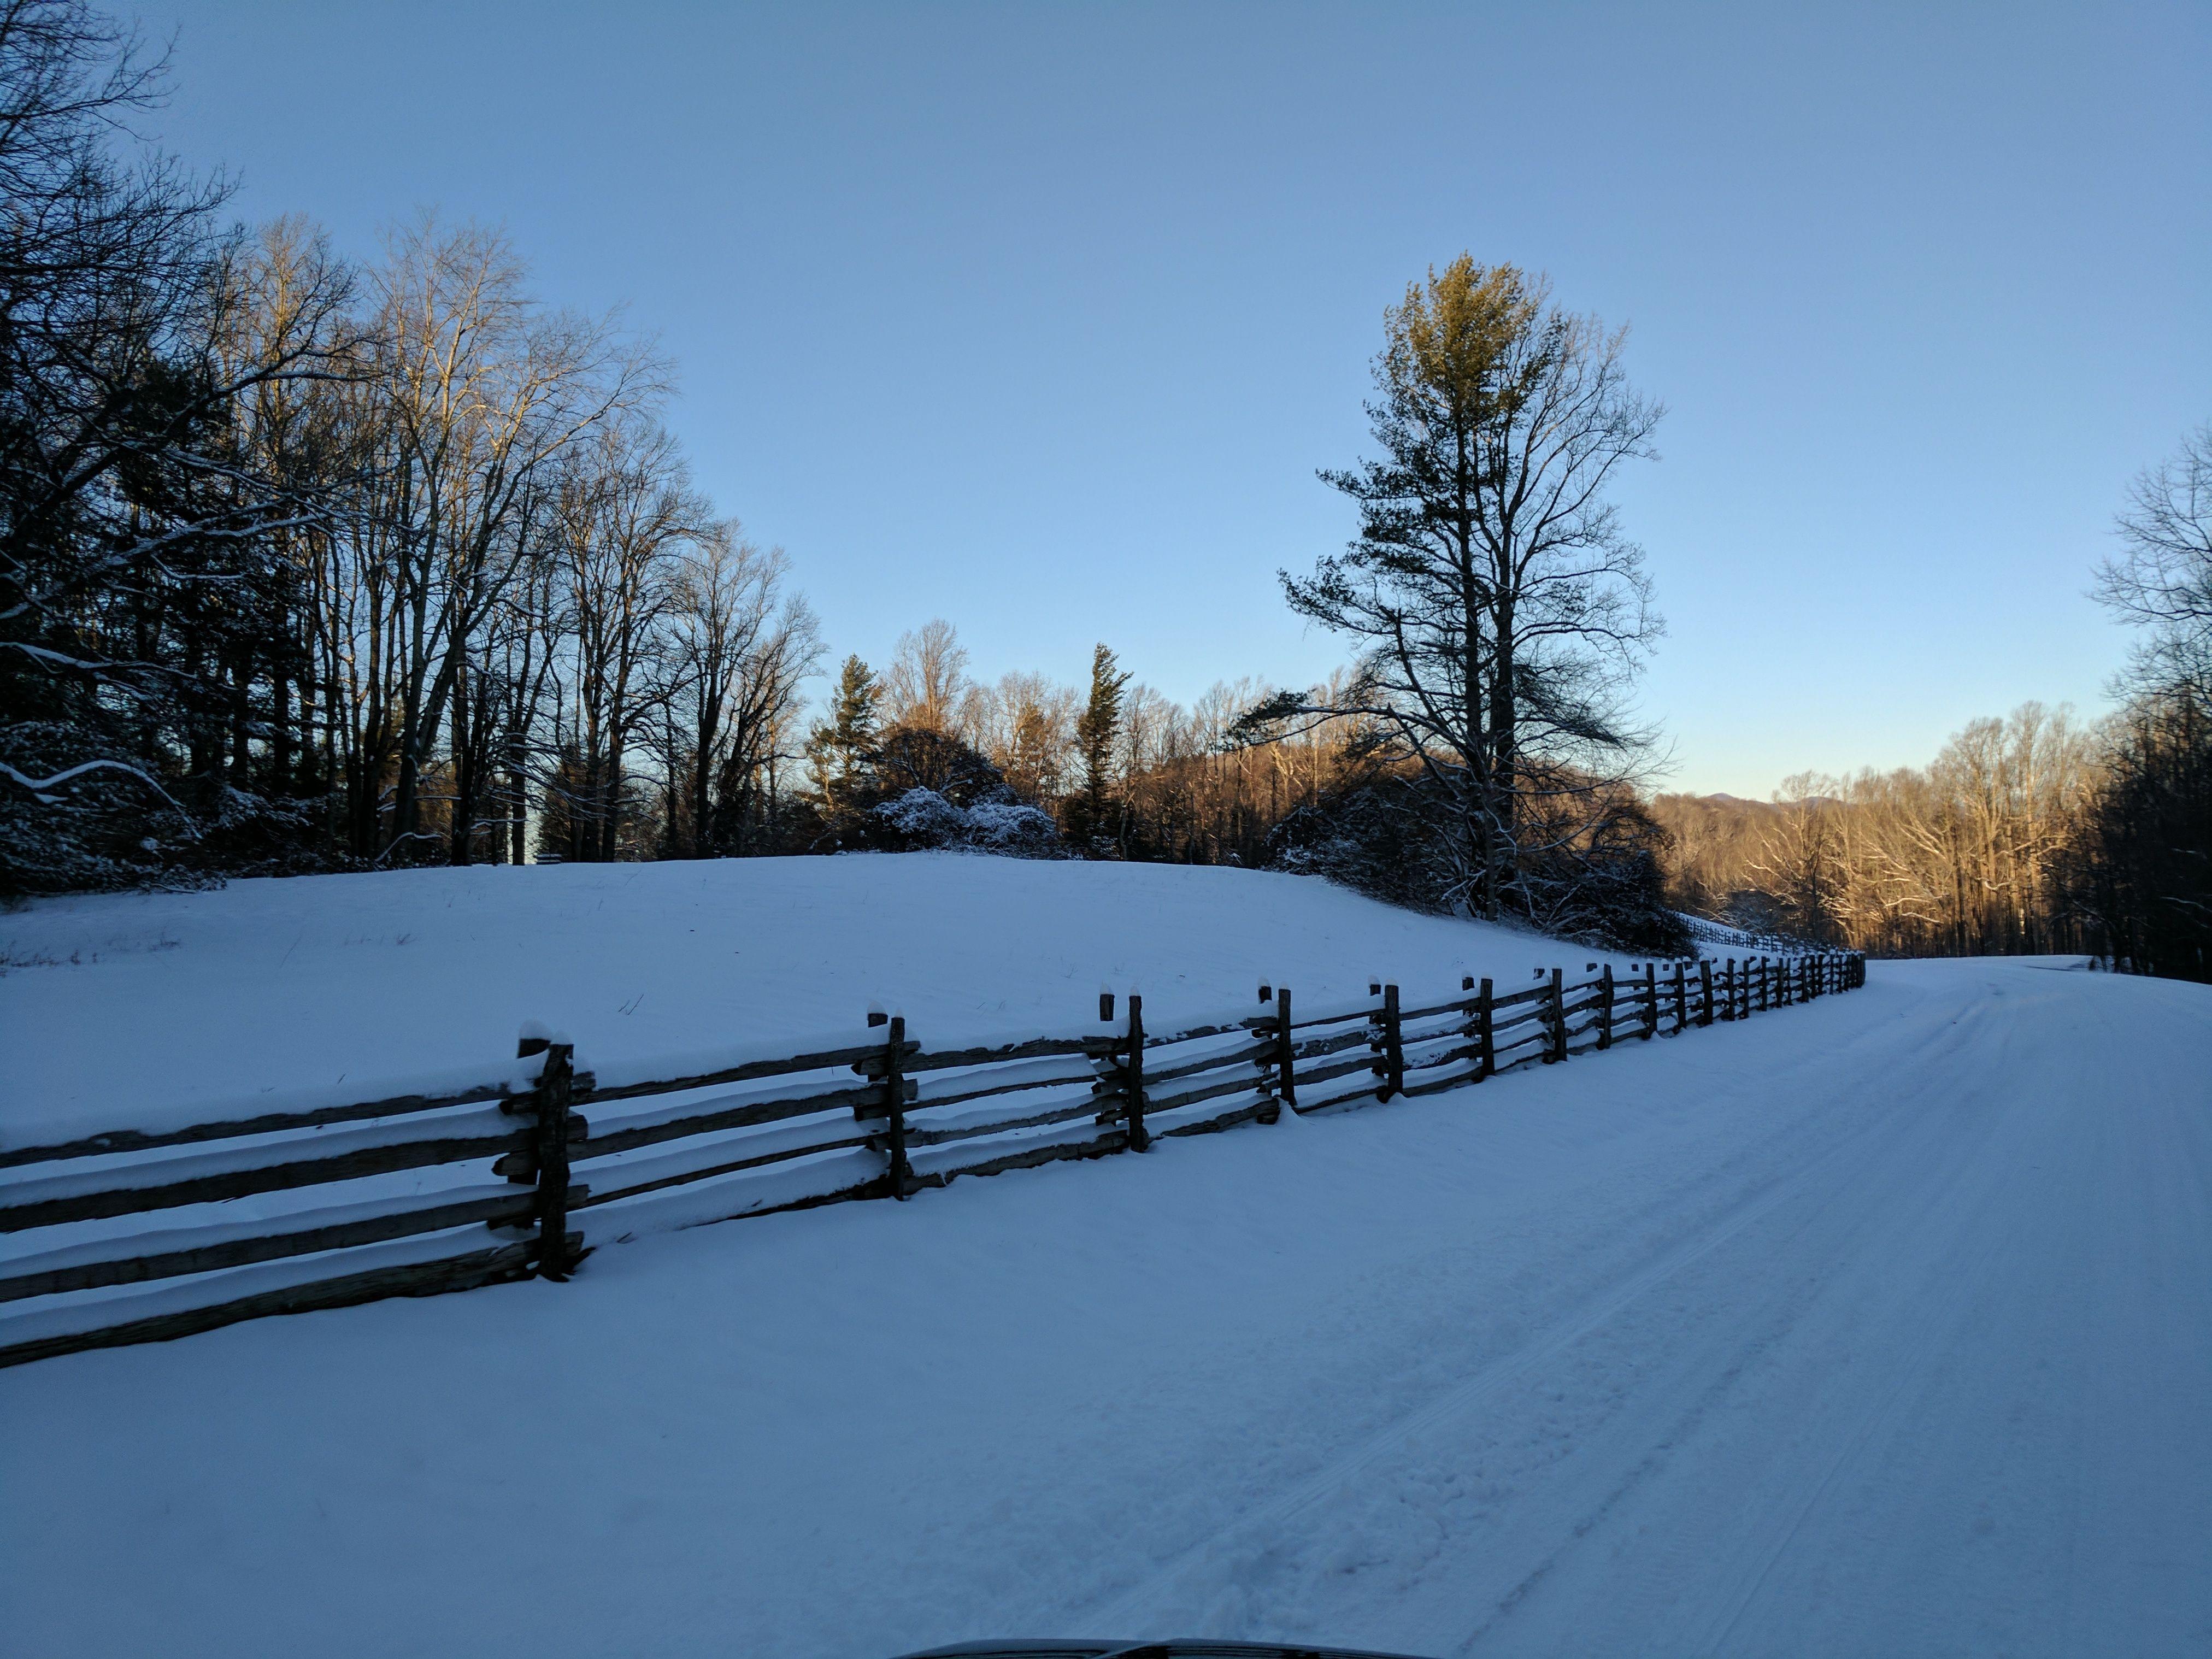 appalachian mountain cabin rentals | winter photo gallery | winter